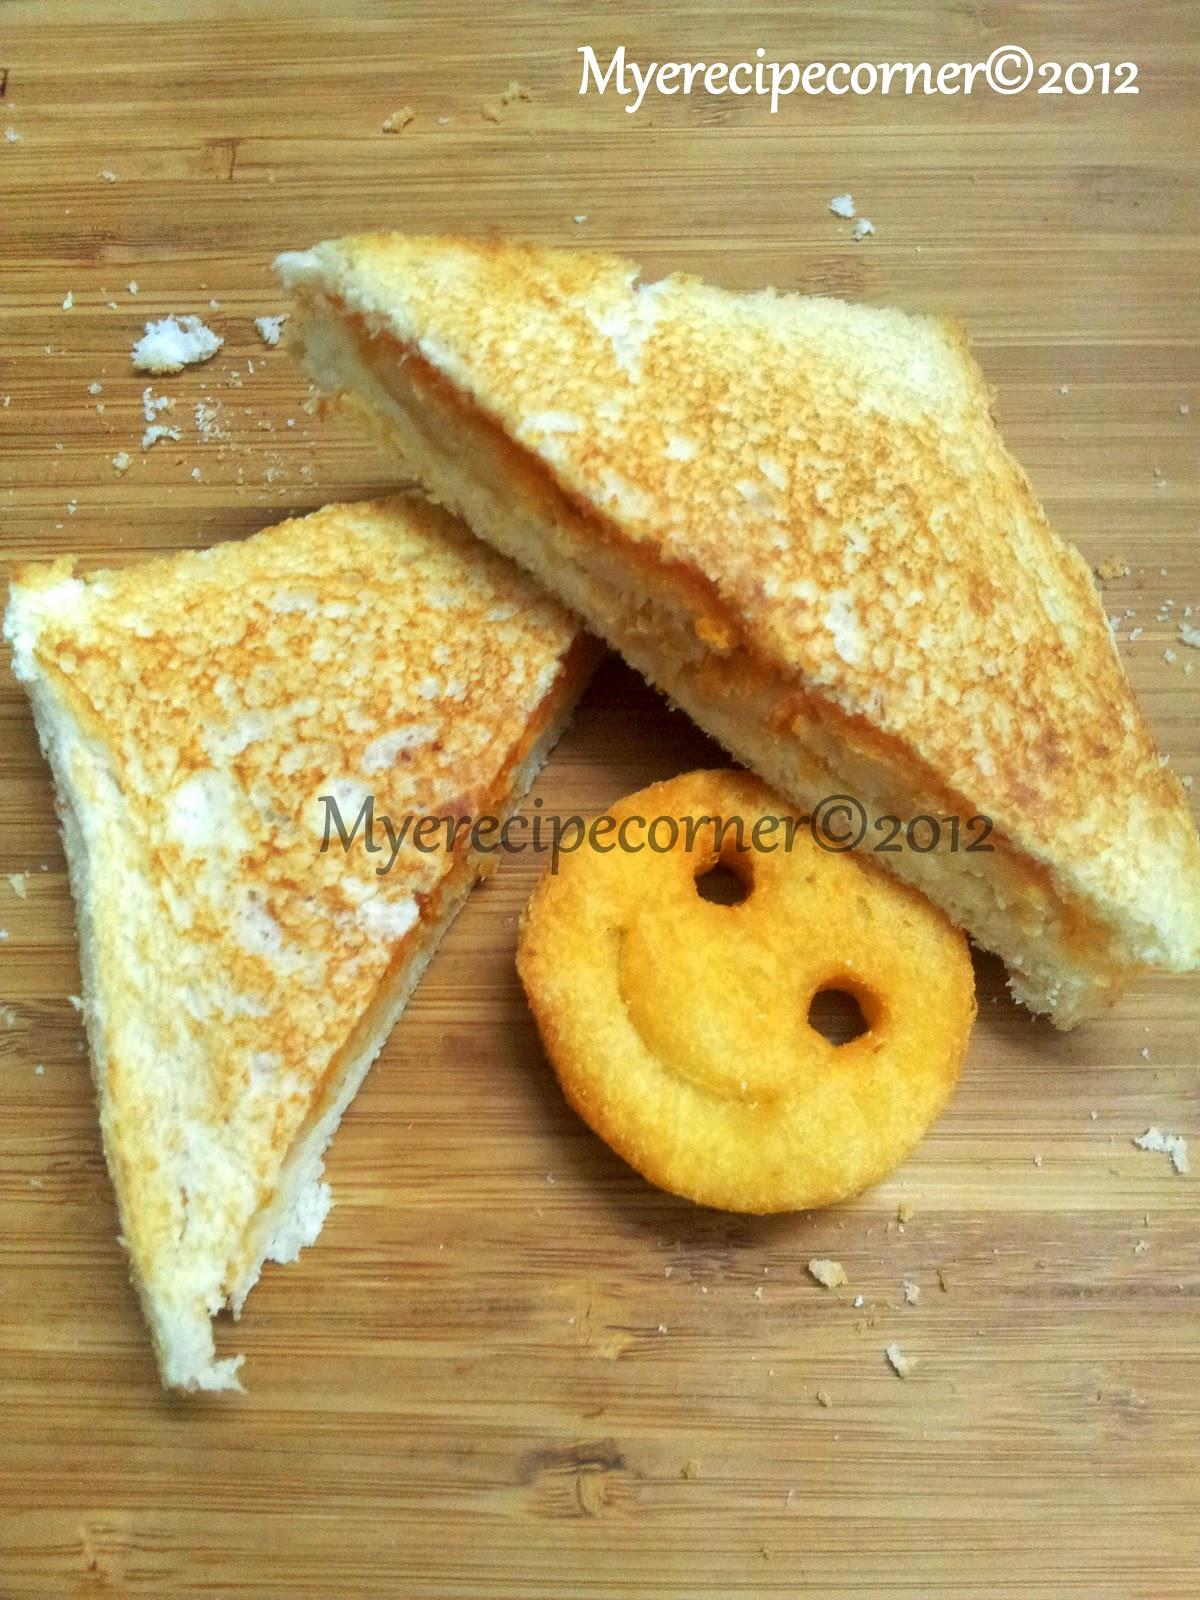 Smiley Potato Sandwich Kids Lunch Box Recipes Indian